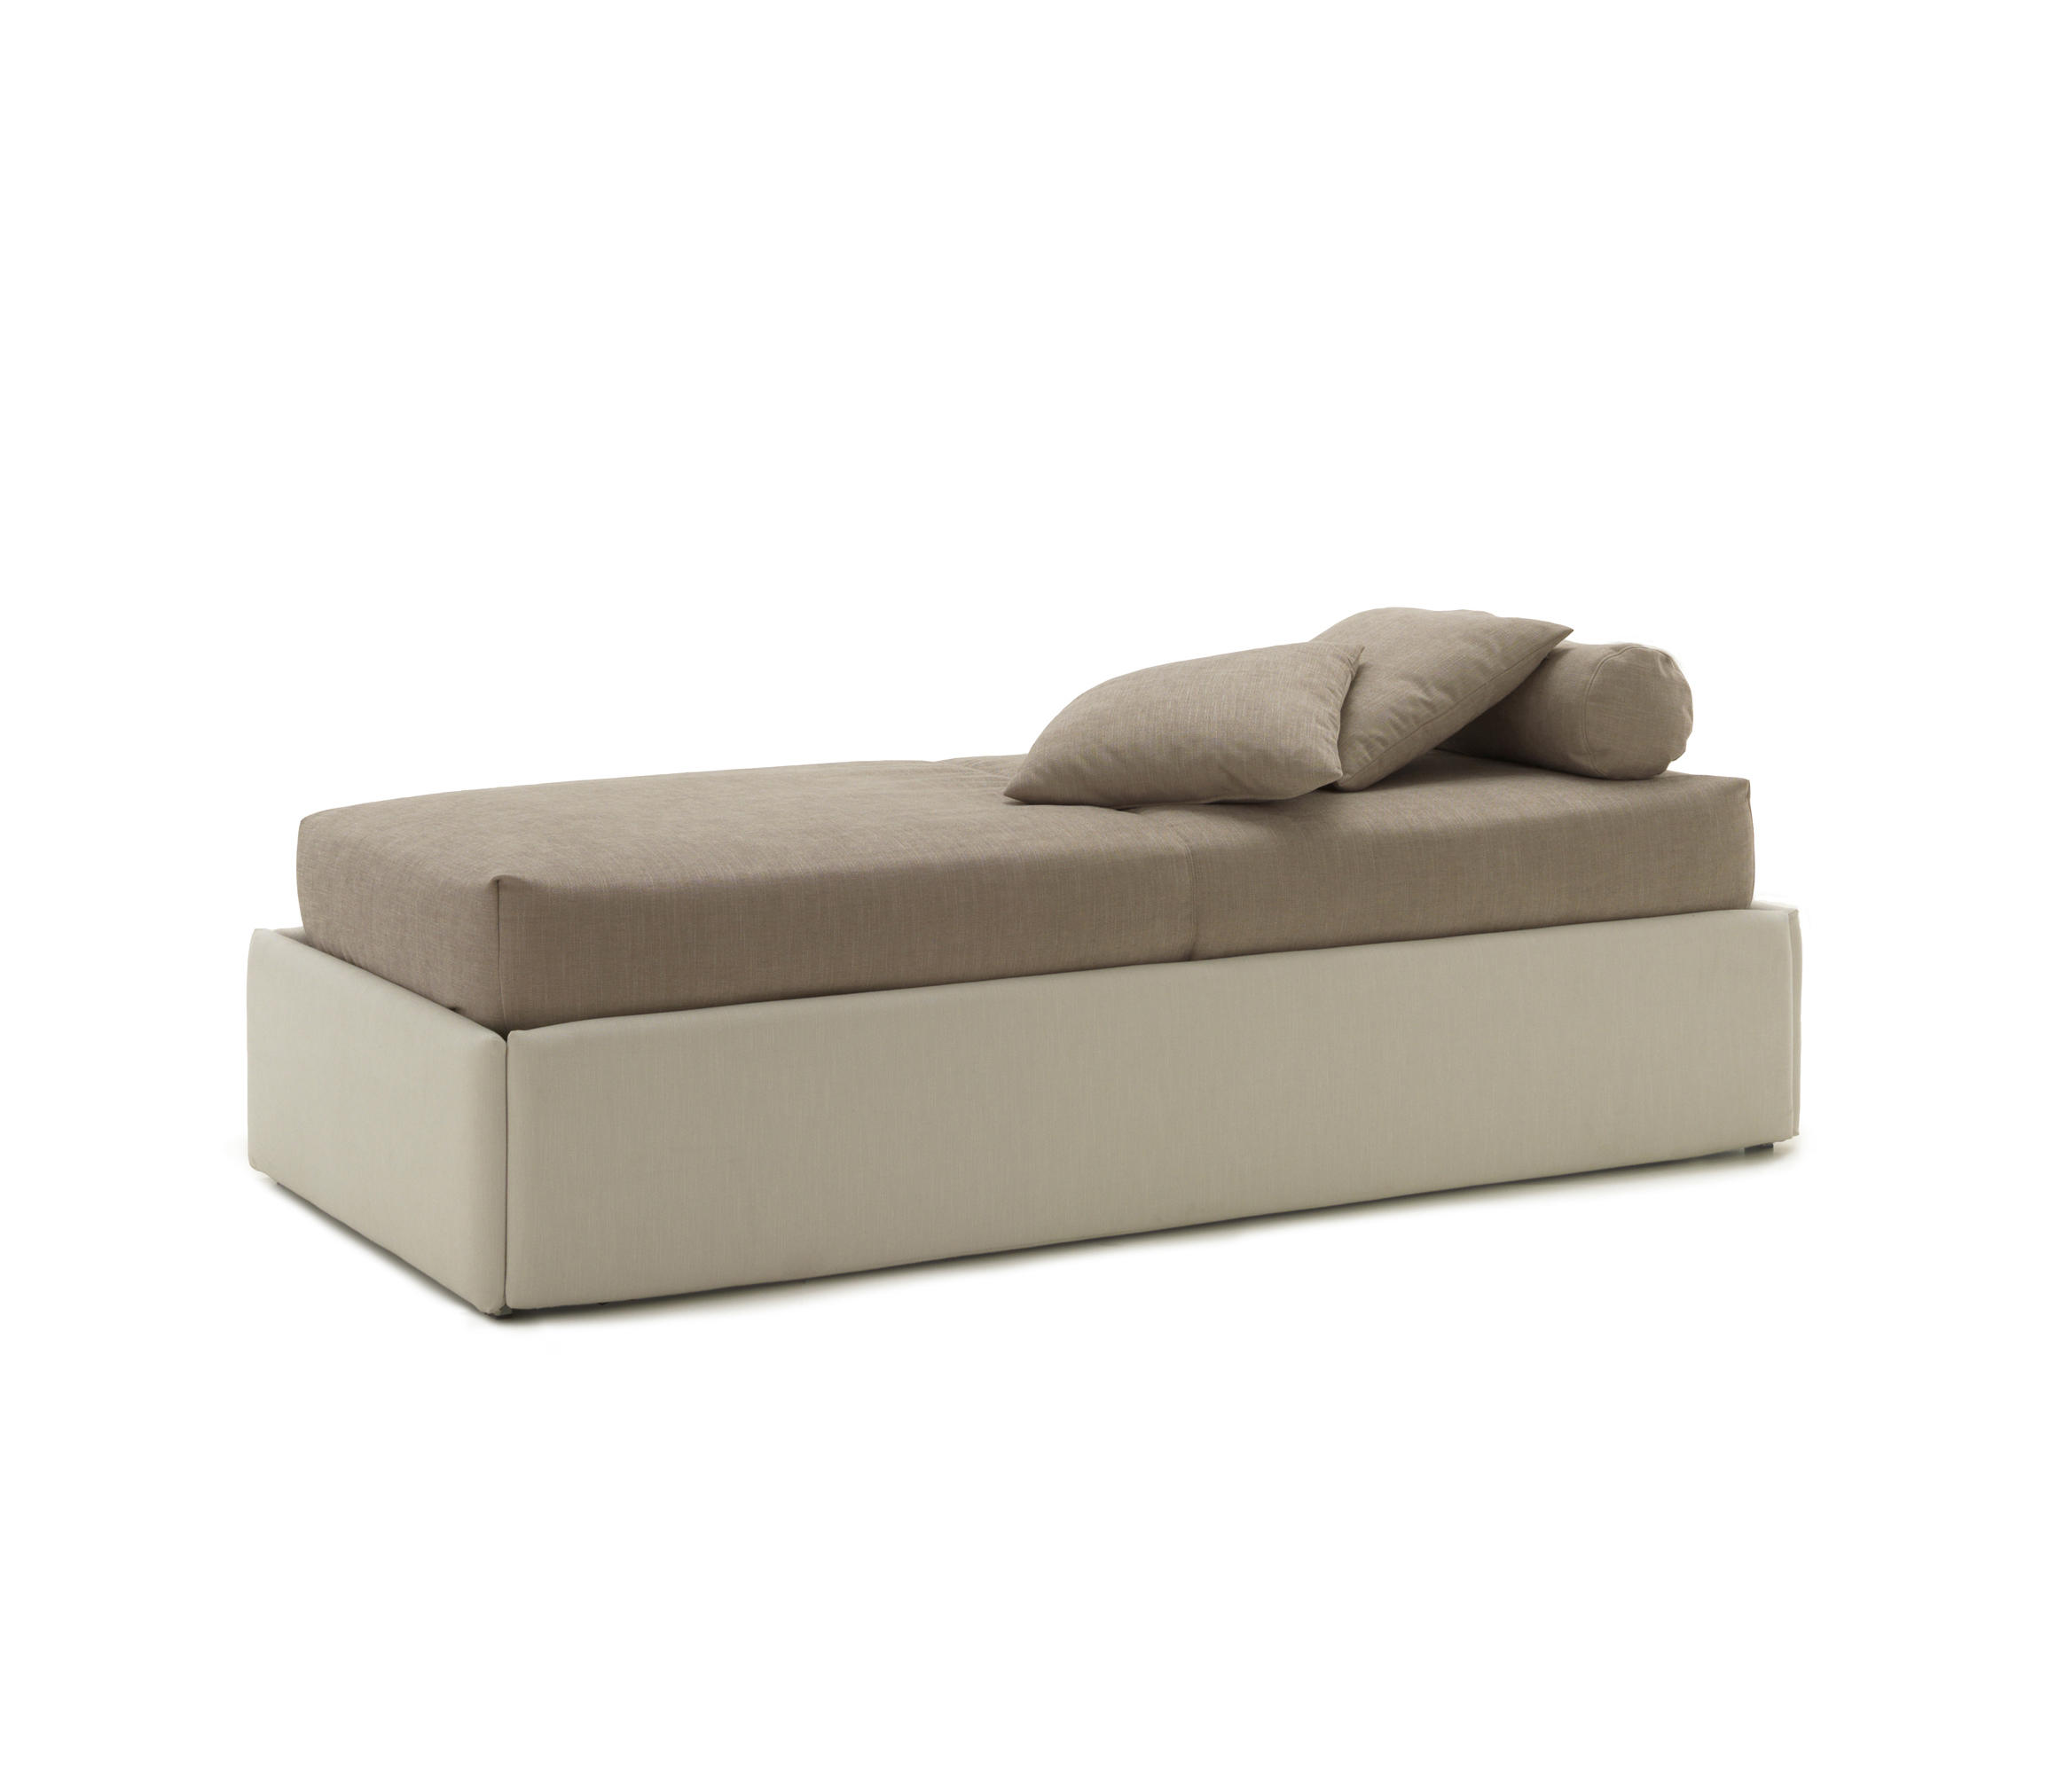 LINE 01 - Single beds from Bolzan Letti | Architonic